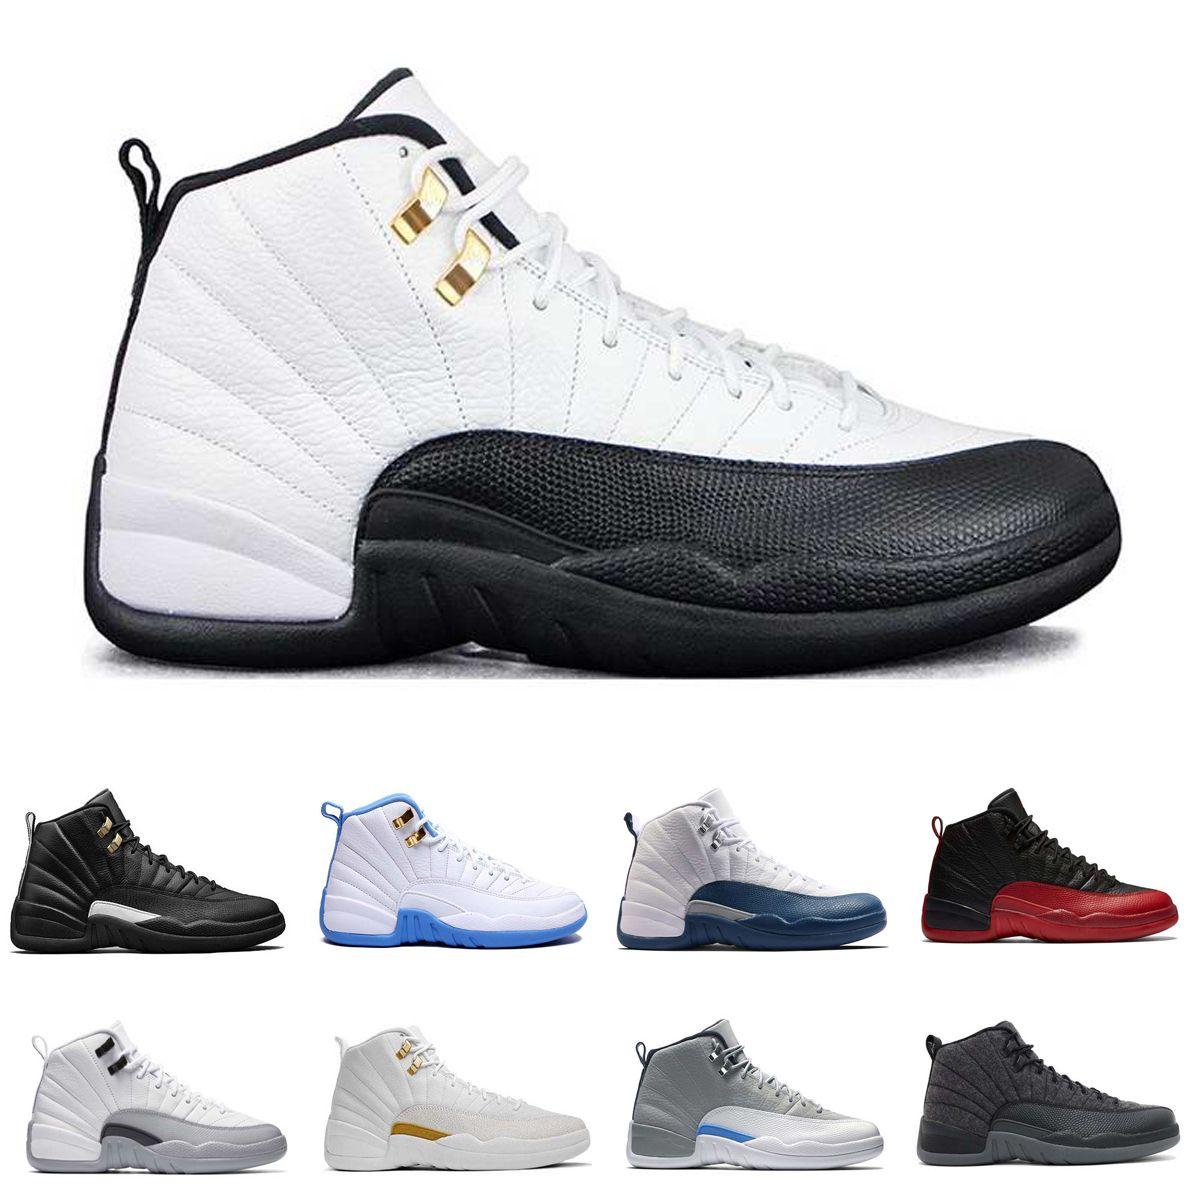 detailed look 5946f b79fd Acquista Nike AIR JORDAN Retro 12 Aj Basketball 2018 Mens Scarpe Da Basket 12  12s TAXI Playoff BLAck Flu Gioco Cherry 12s XII Uomini Sneakers Stivali ...